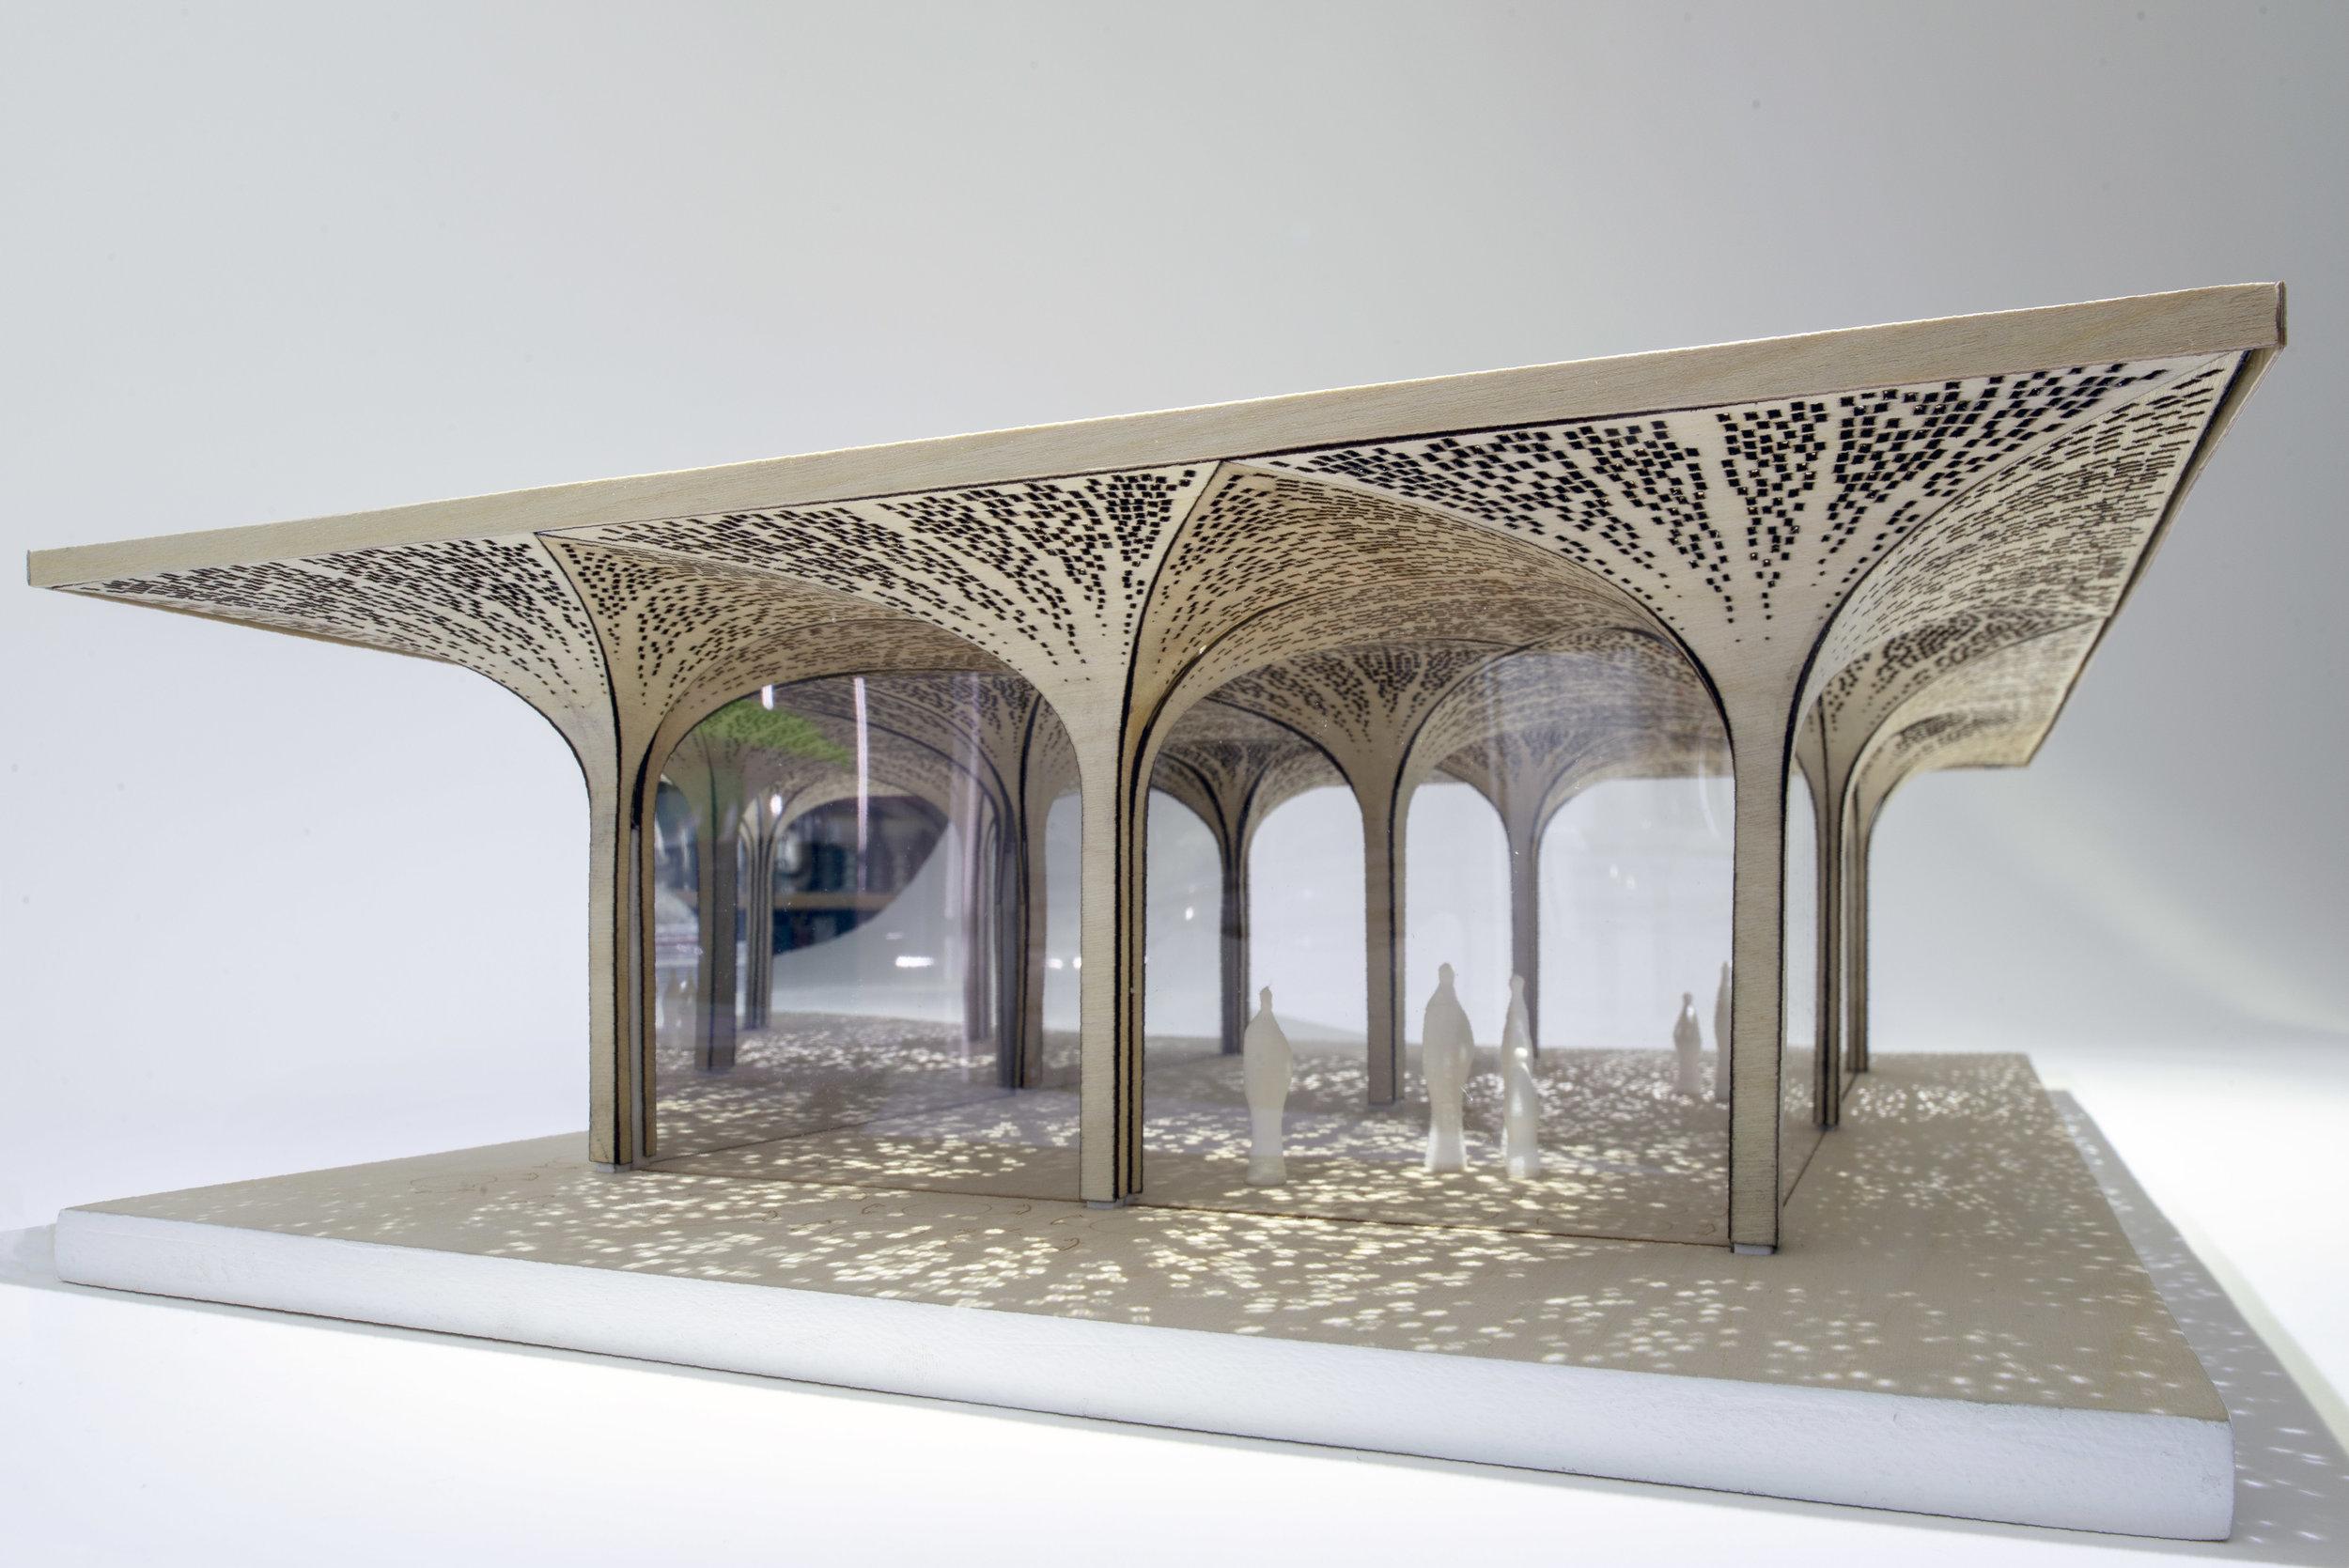 Paddington_Willow_Pavilion_Model_Tonkin_Liu_Royal_Academy_Summer_Exhibition